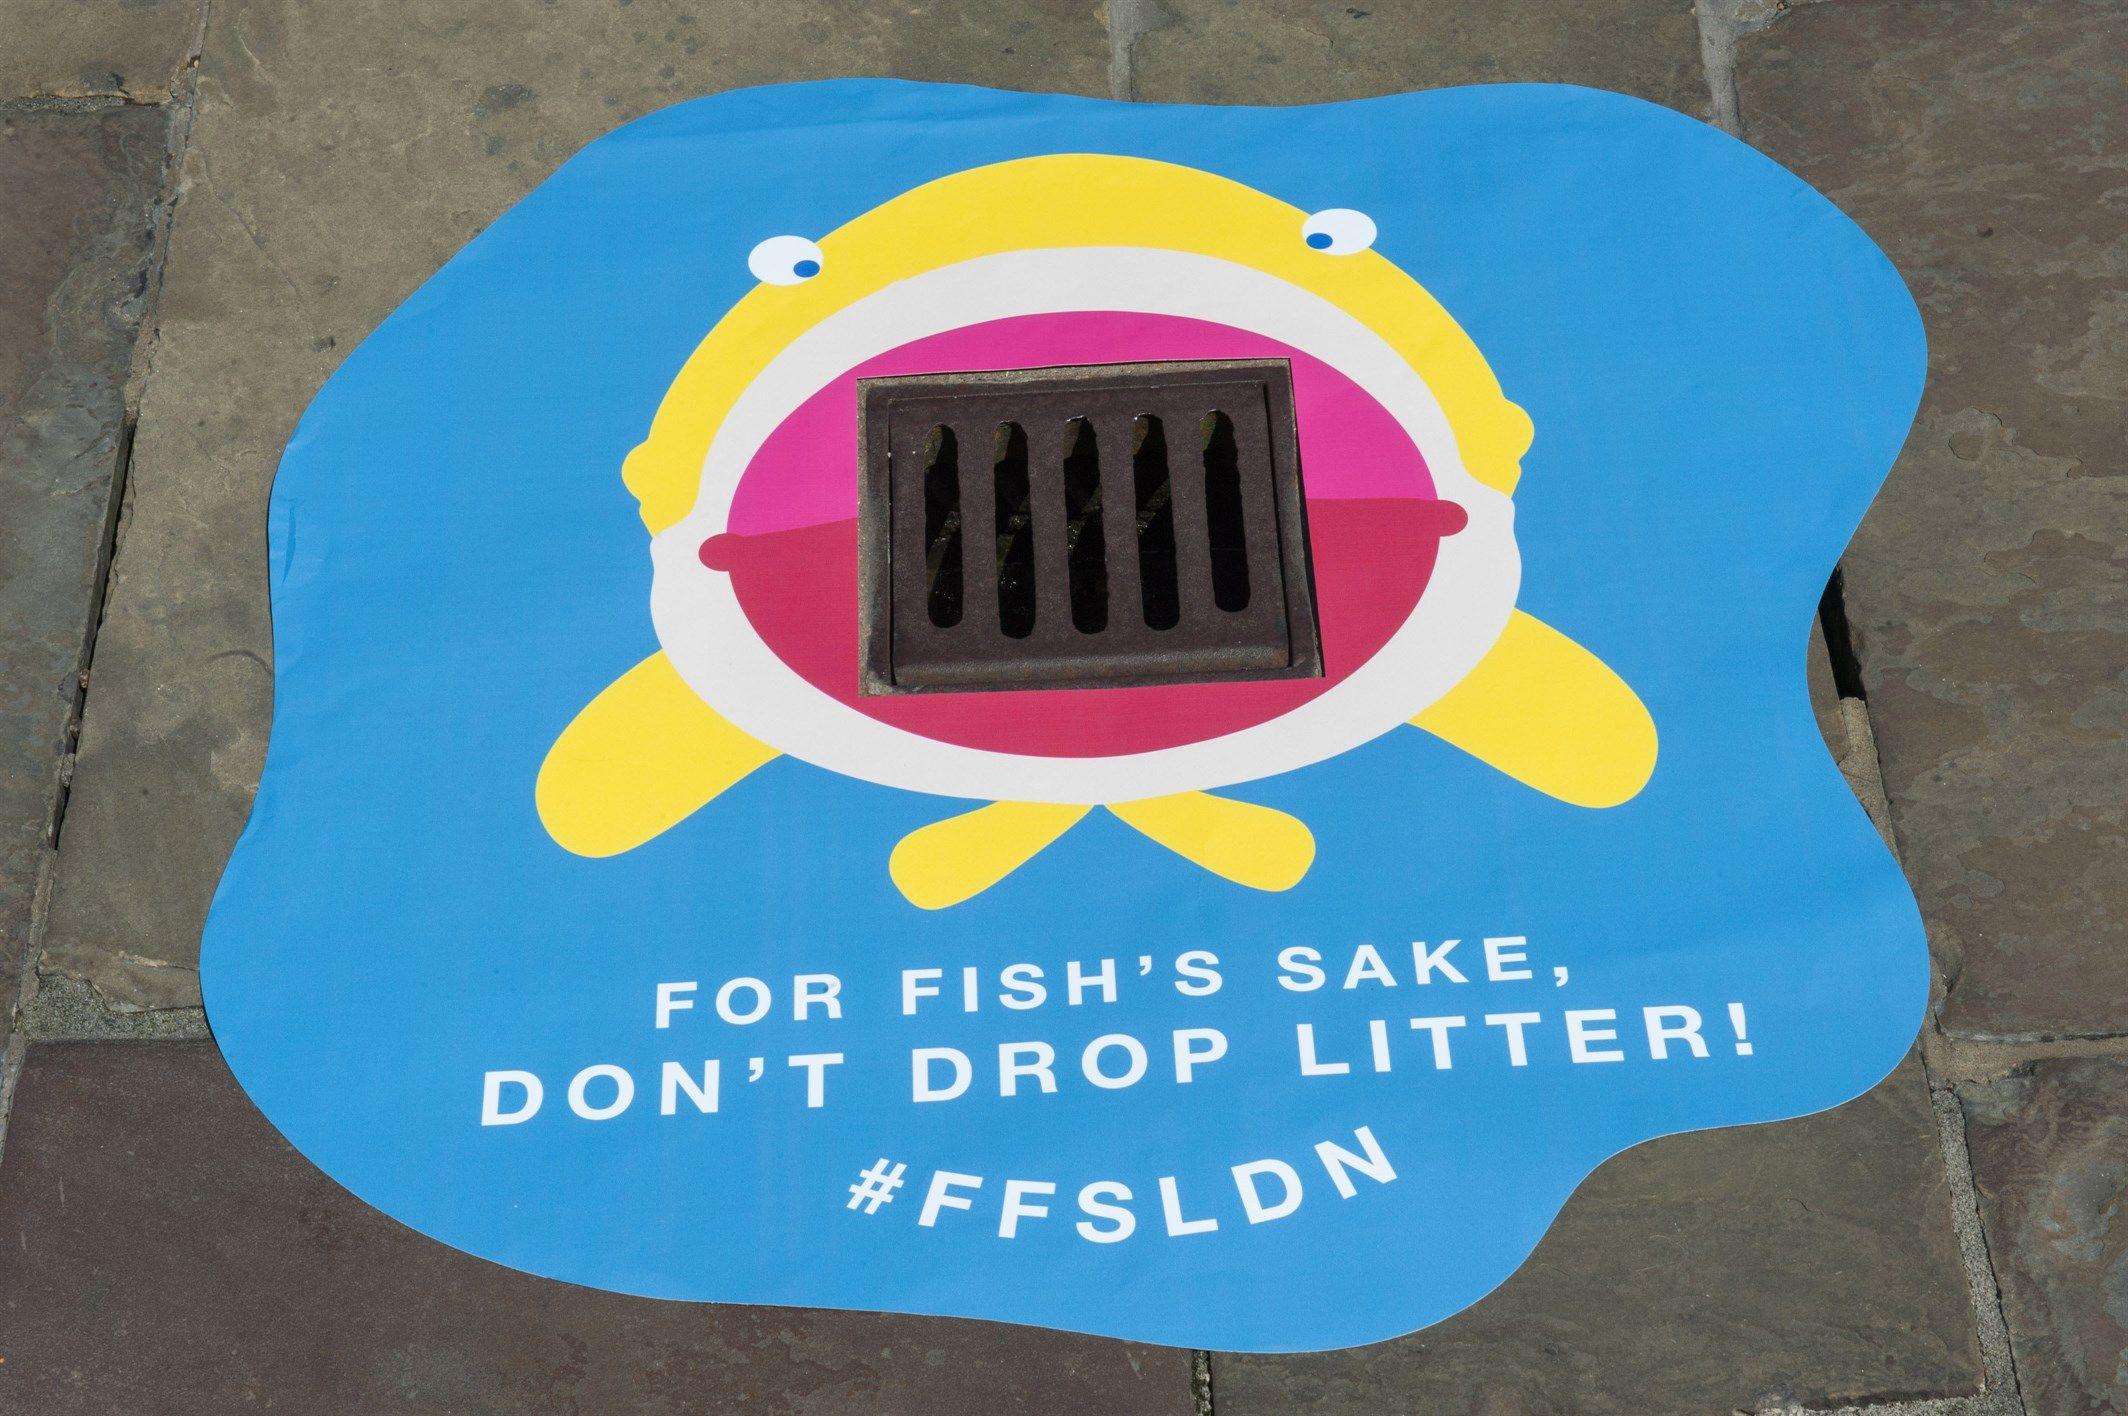 For fishs sake dont drop litter guerrilla advertising